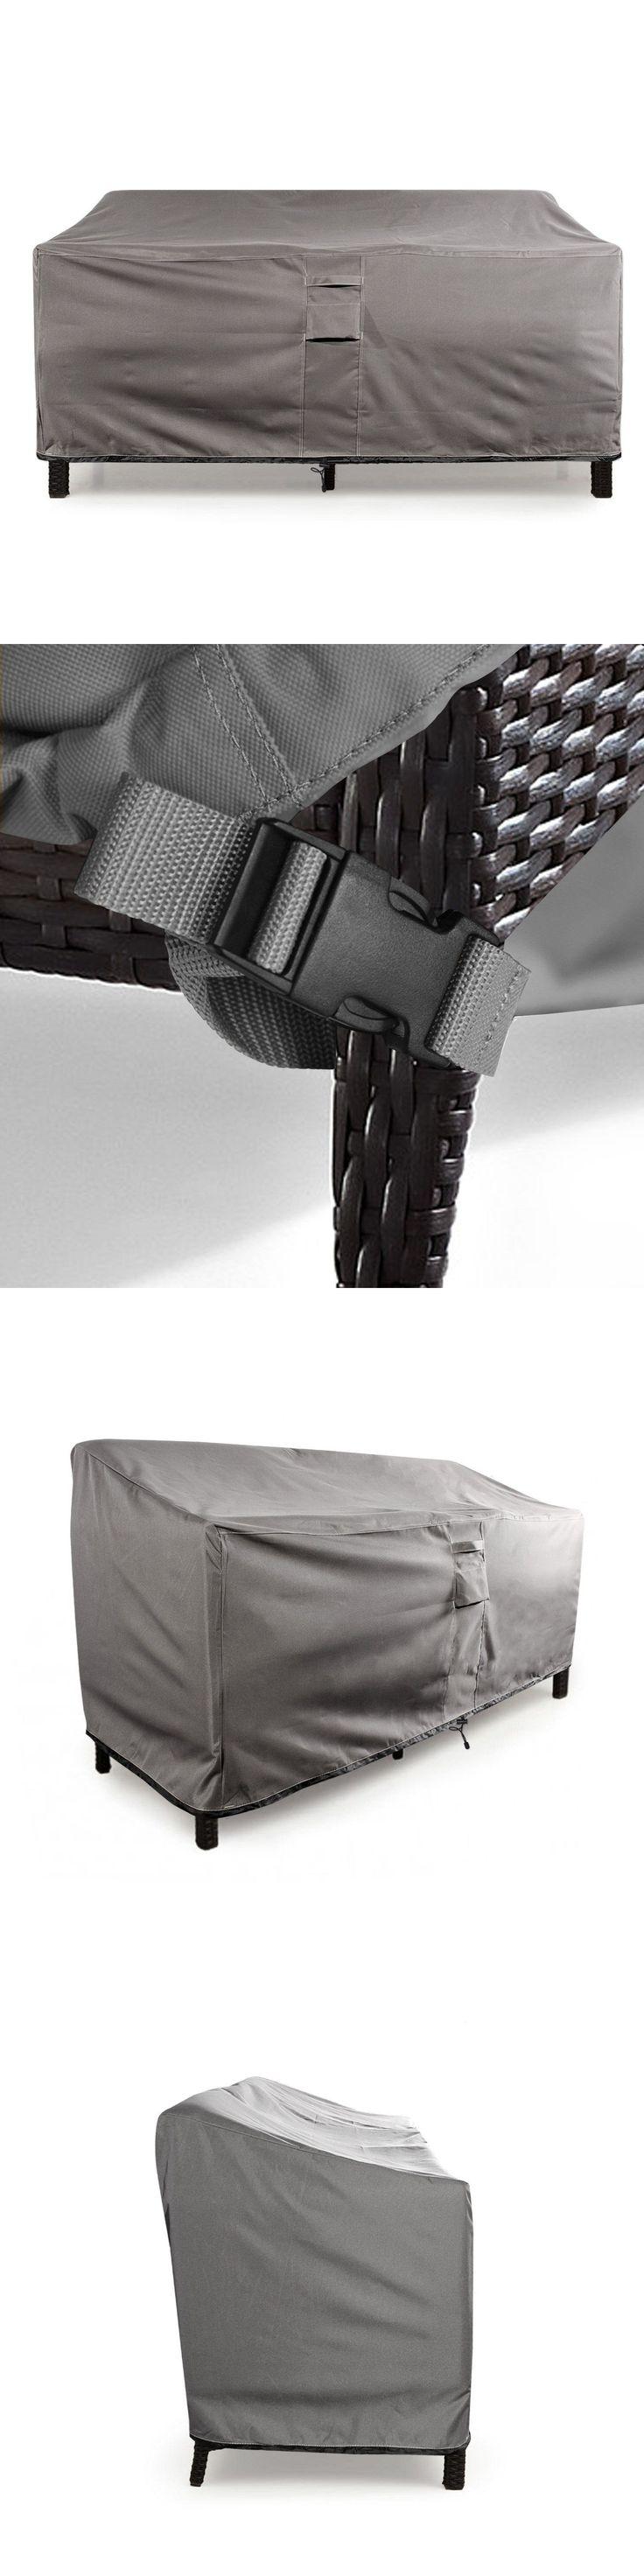 Extra Sofa Cover Outdoor Patio Armor SF X Mega